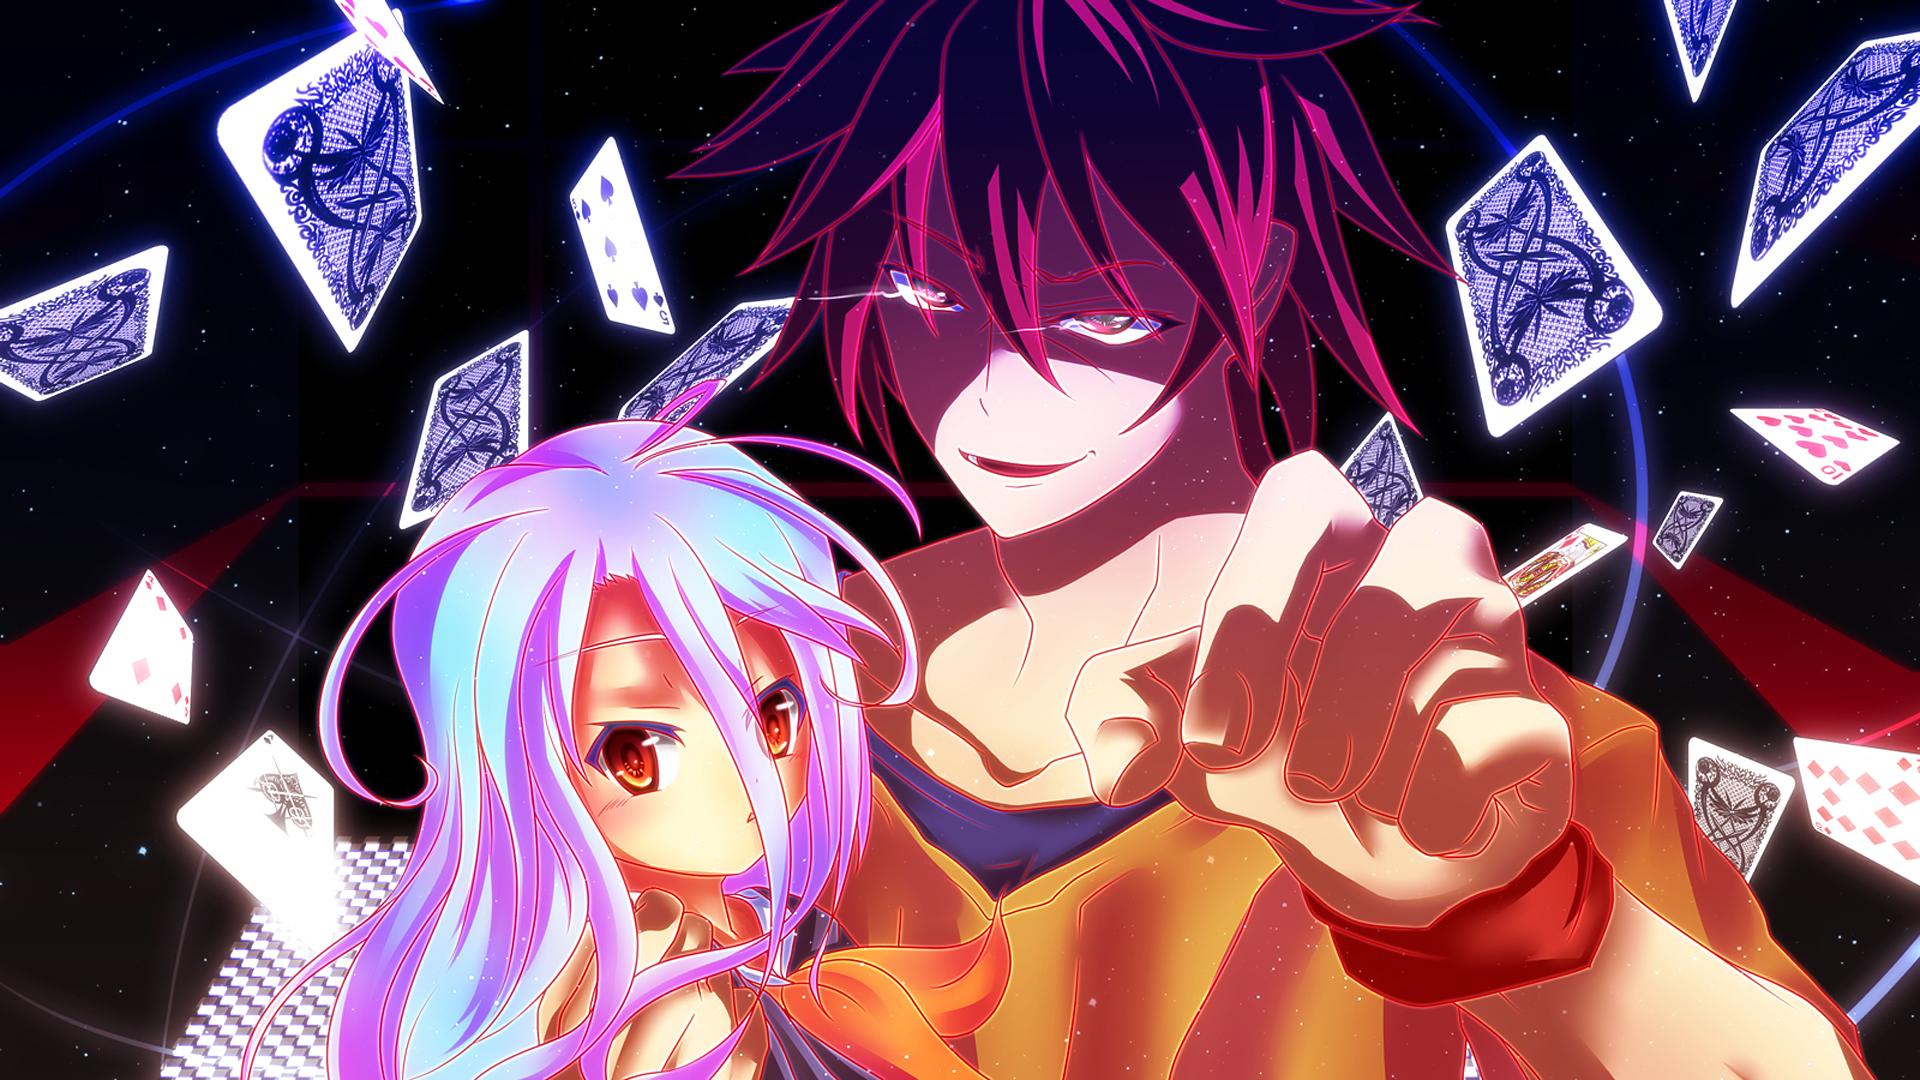 shiro and sora no game no life anime hd 1920x1080 1080p wallpaper and 1920x1080